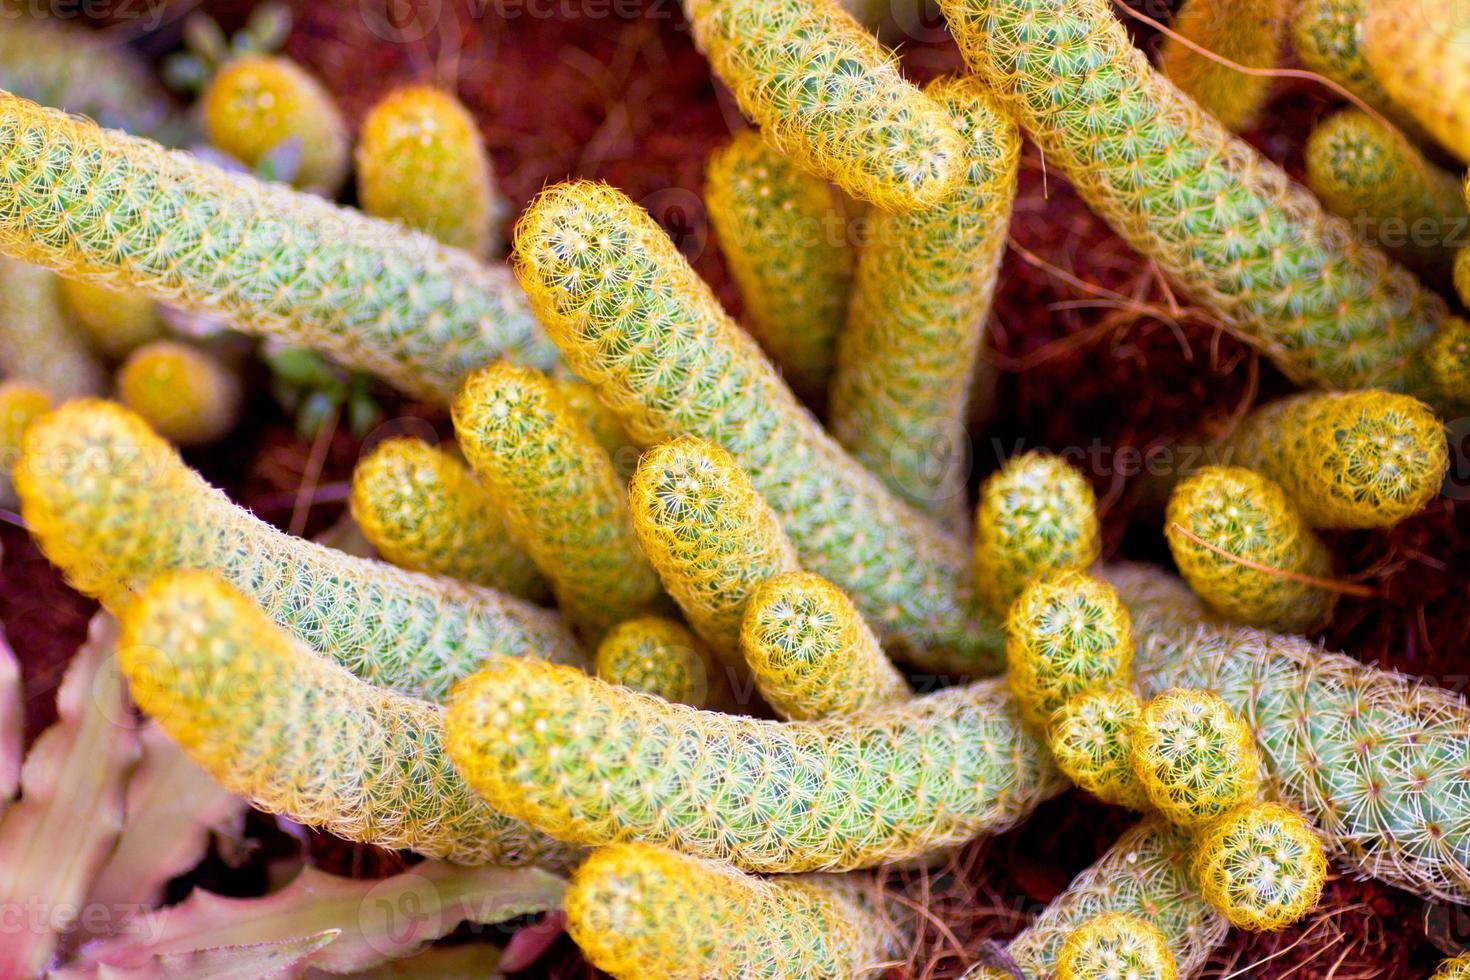 fiori di cactus foto